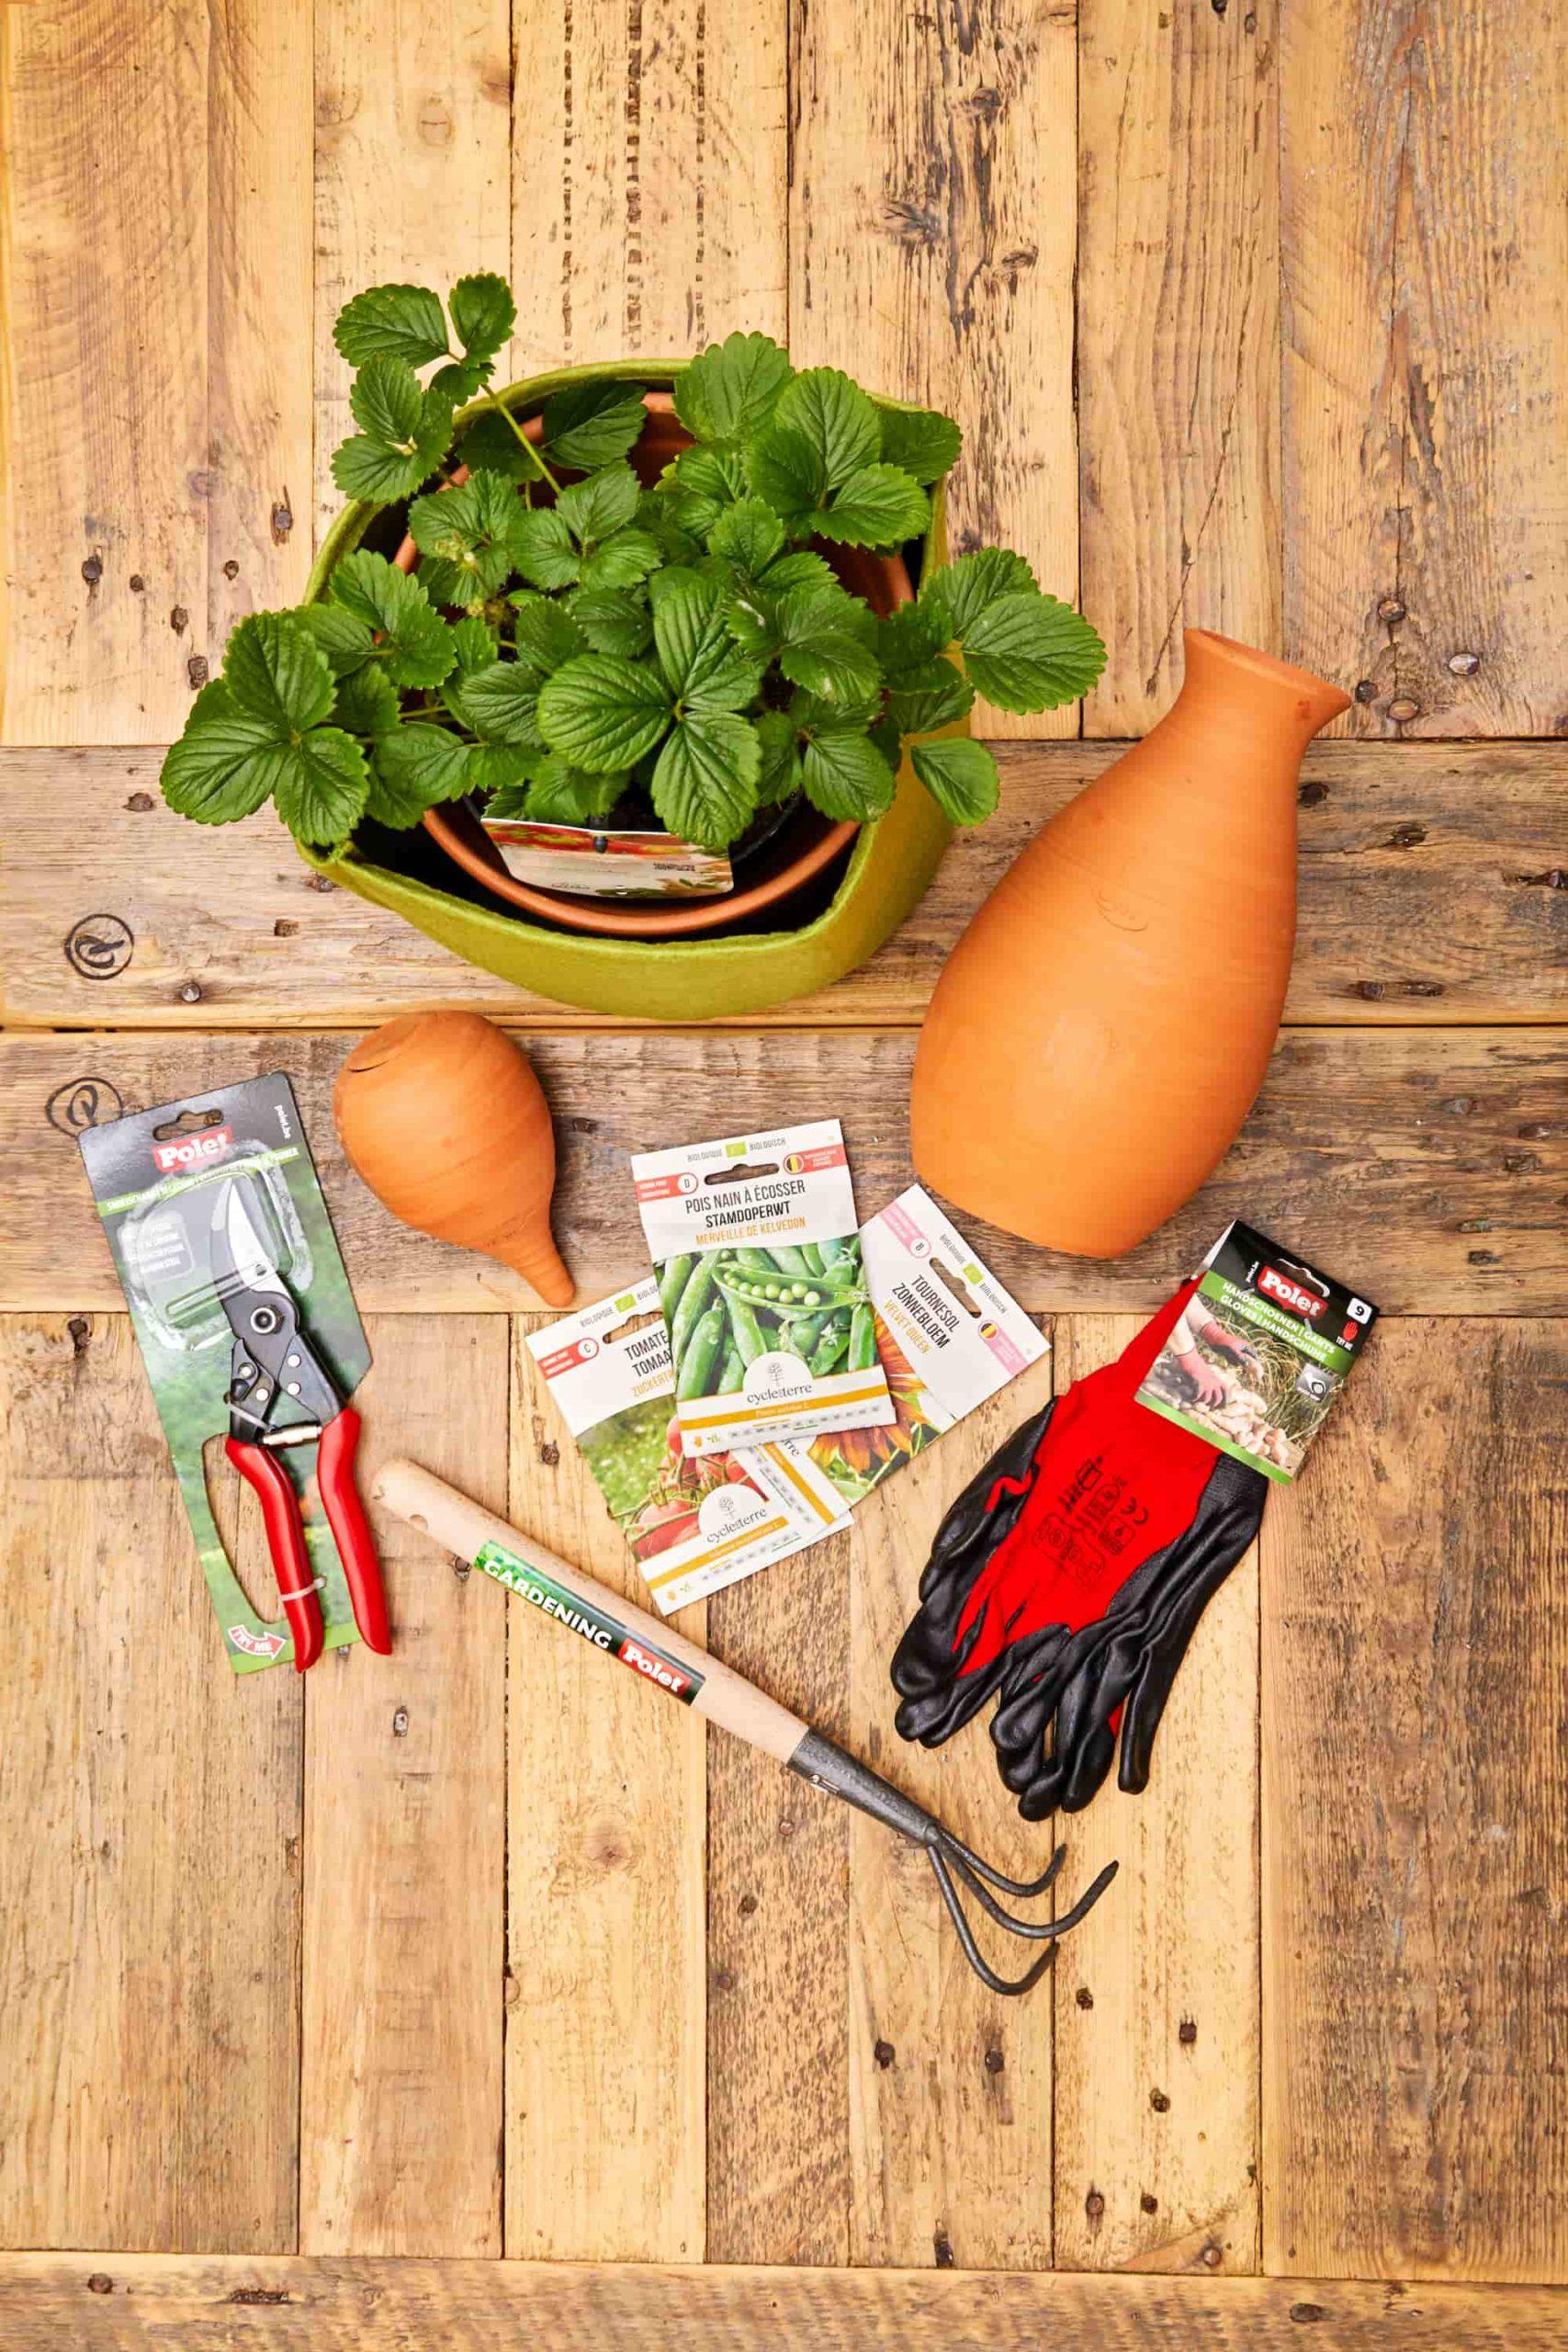 Skyfarms outils oyas fraises semences pour jardin potager balcon ou terrasse